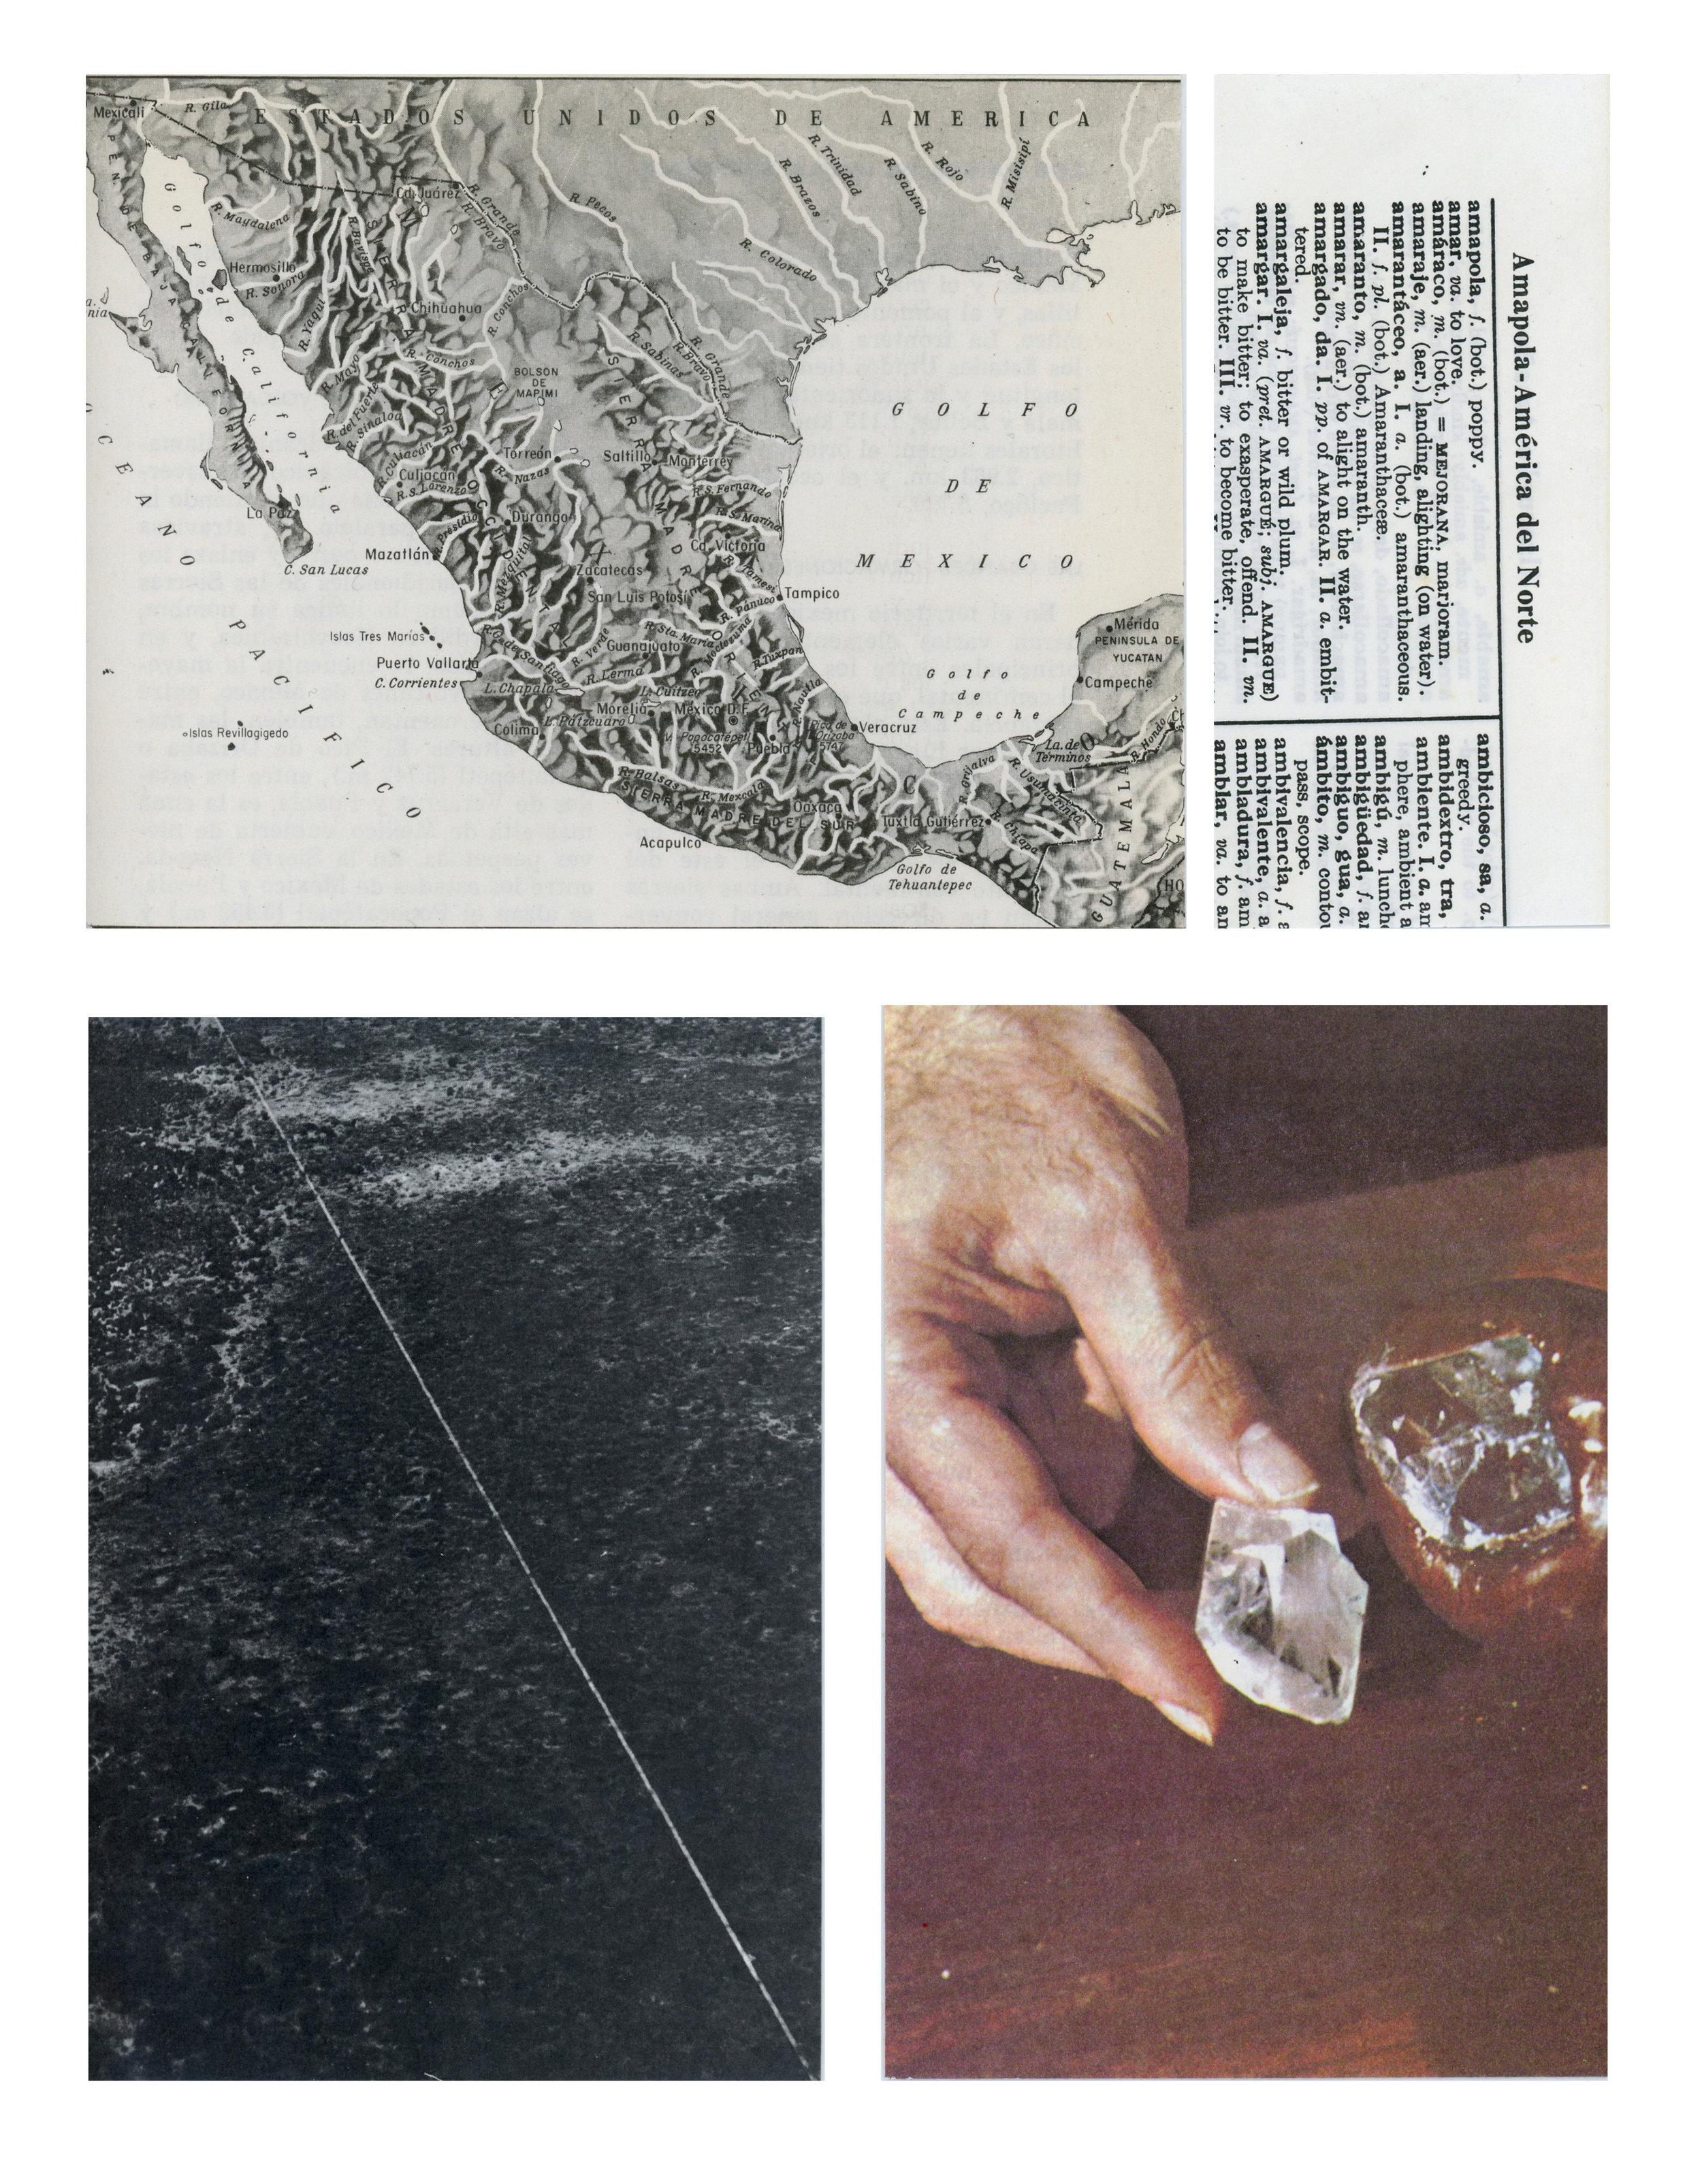 3. amapola-america del norte.jpg